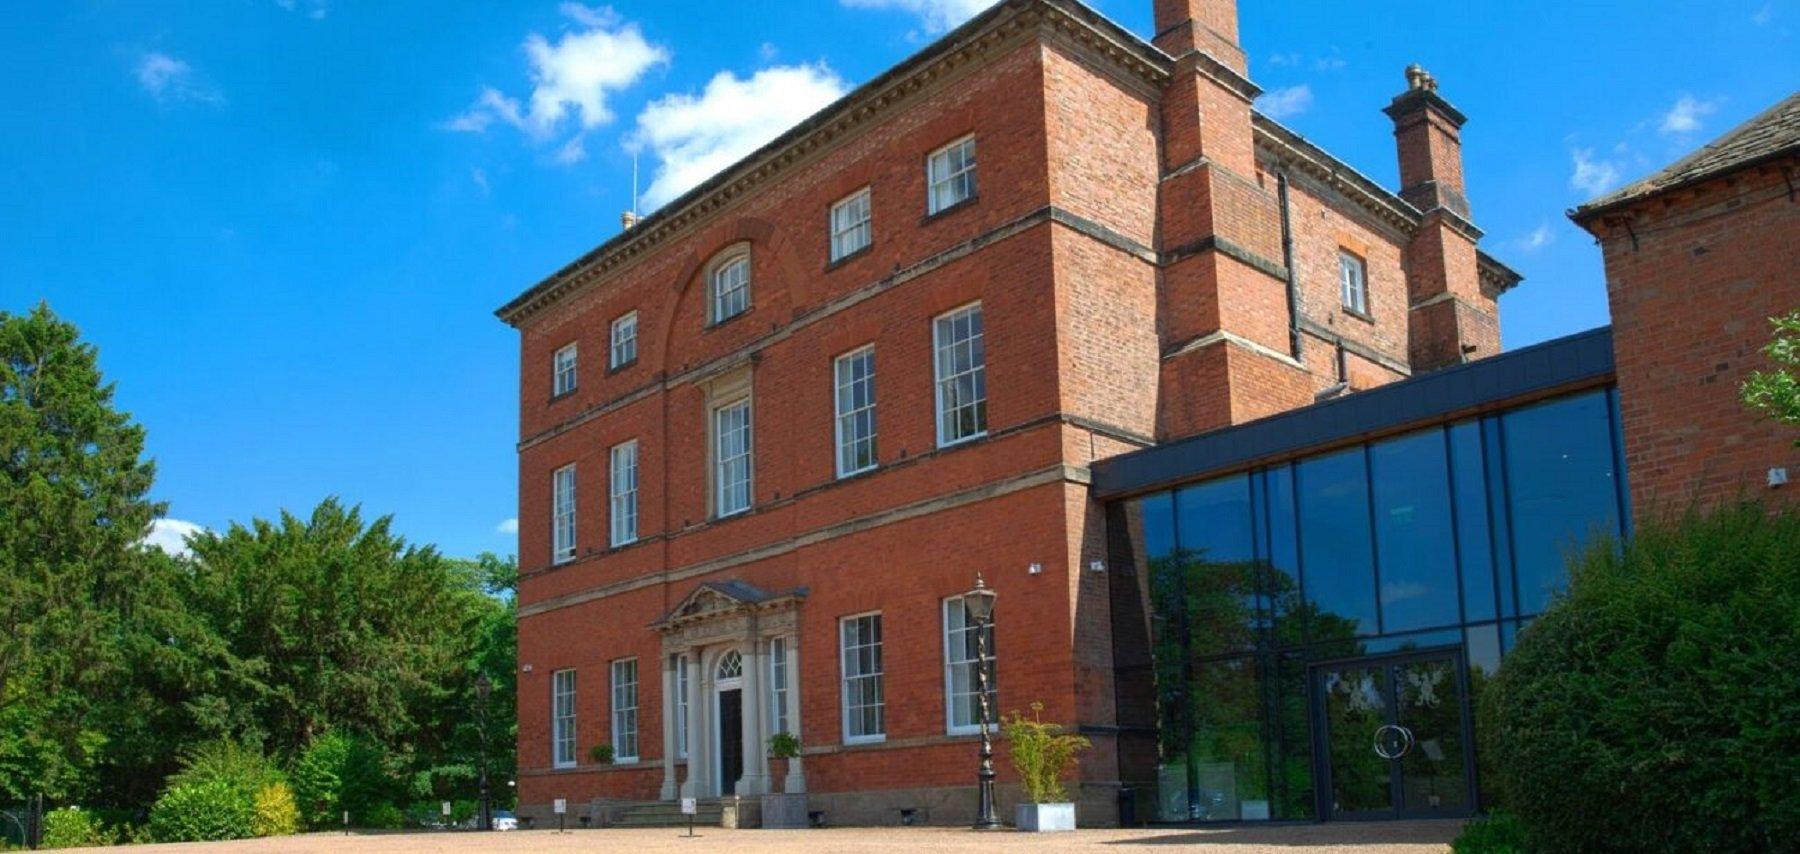 Winstanley House, Braunstone Park, Leicester